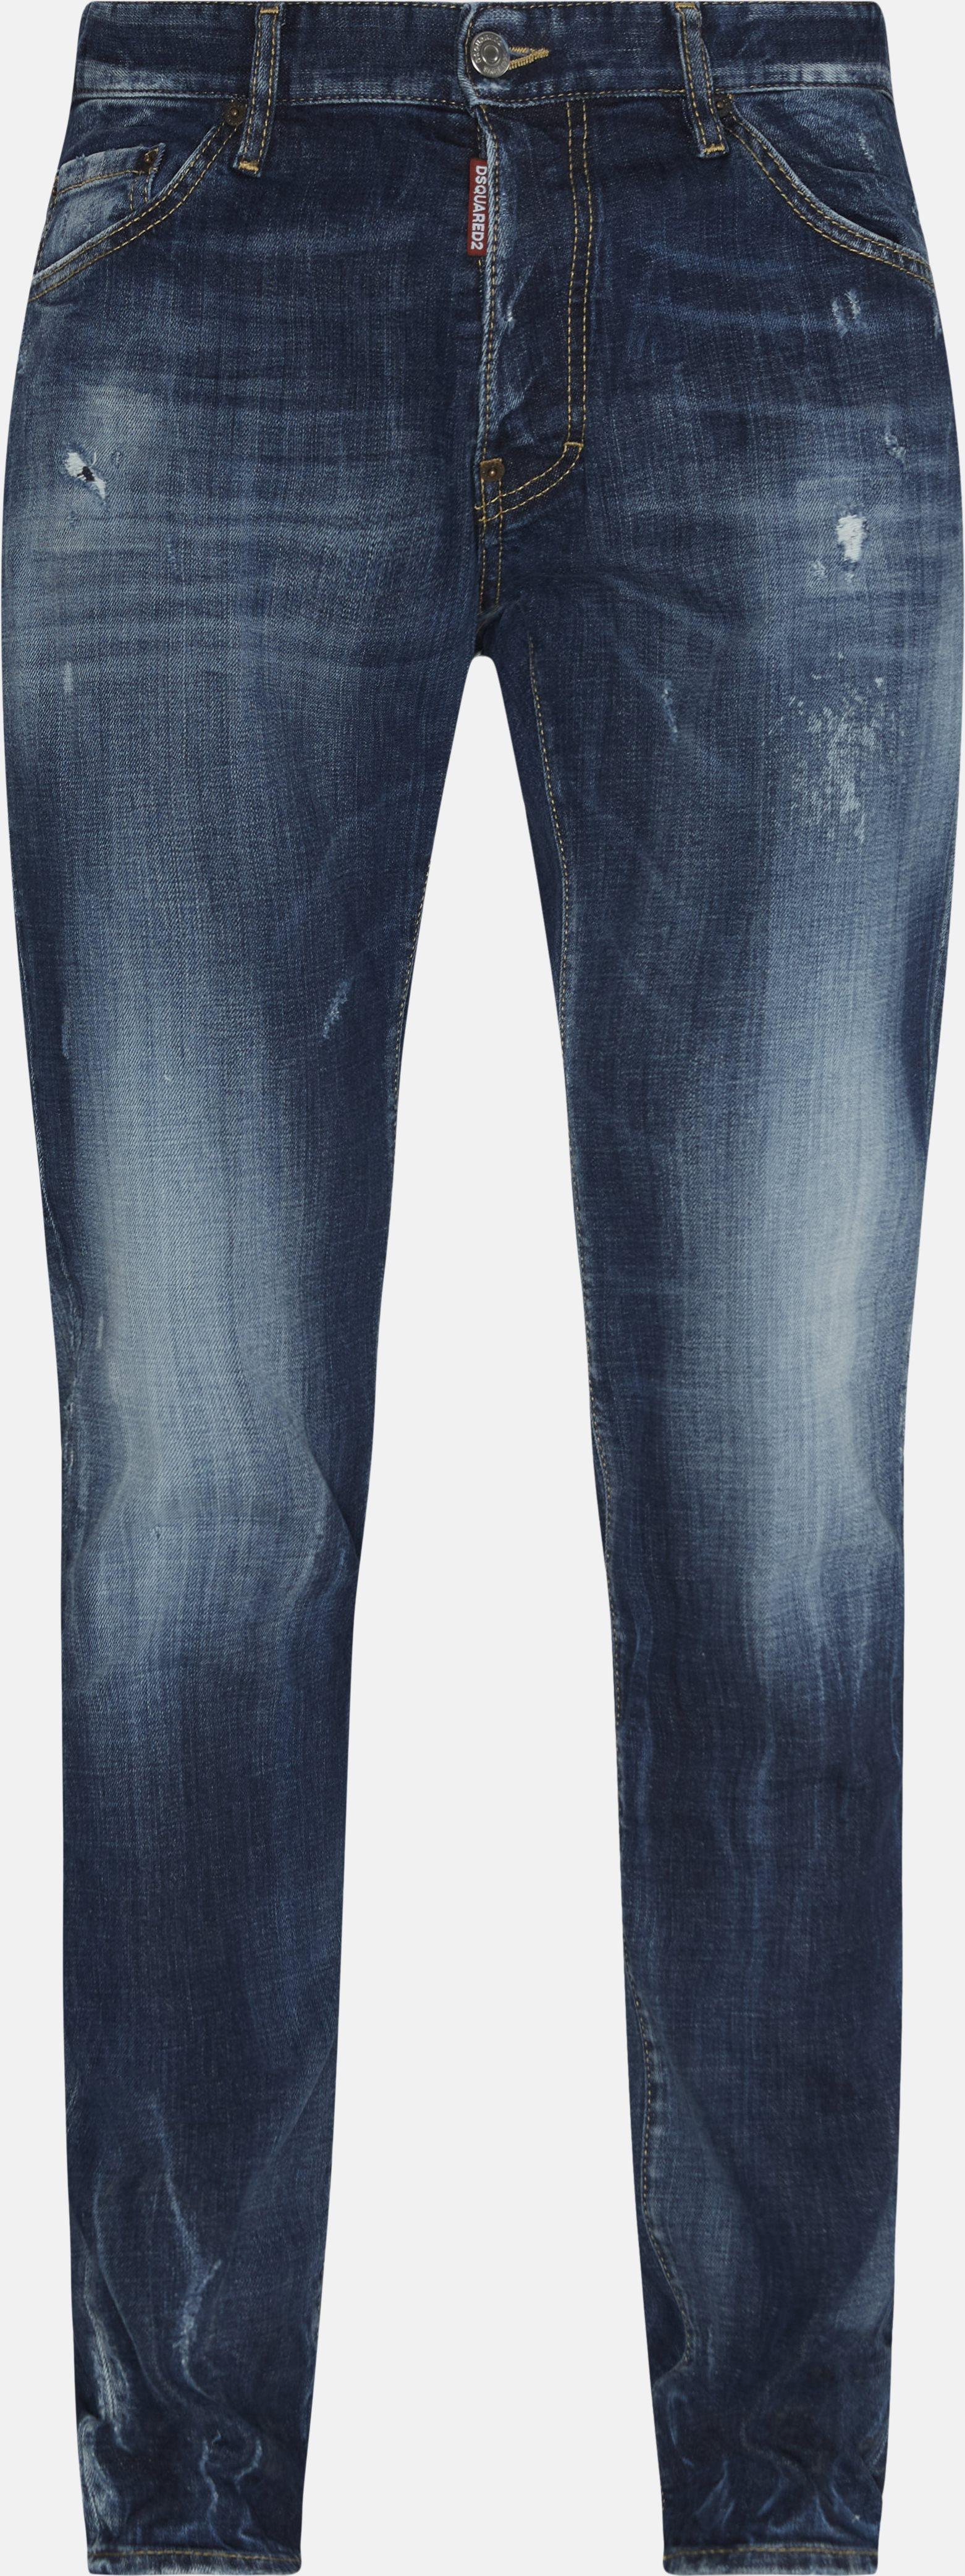 Jeans - Jeans - Slim - Denim